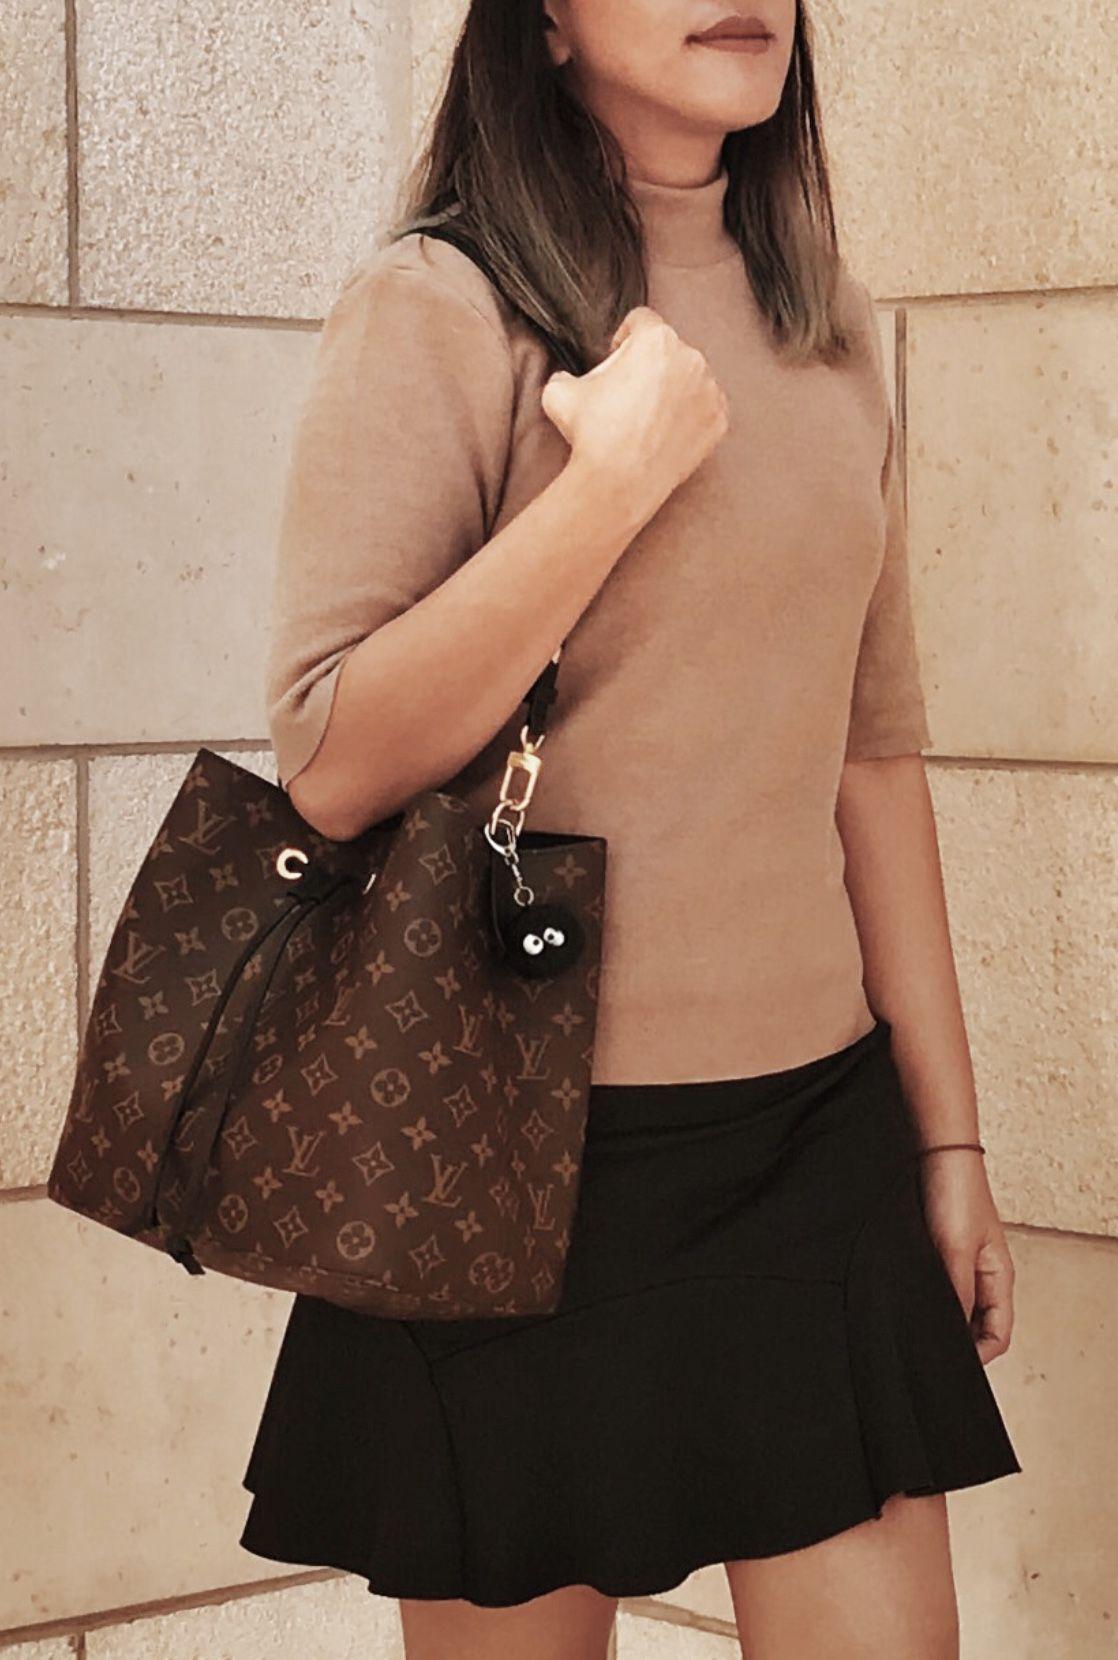 Warm Tones Plus Lovin That Louis Vuitton Neo Noe Bag Louis Vuitton Neonoe Vuitton Outfit Vuitton